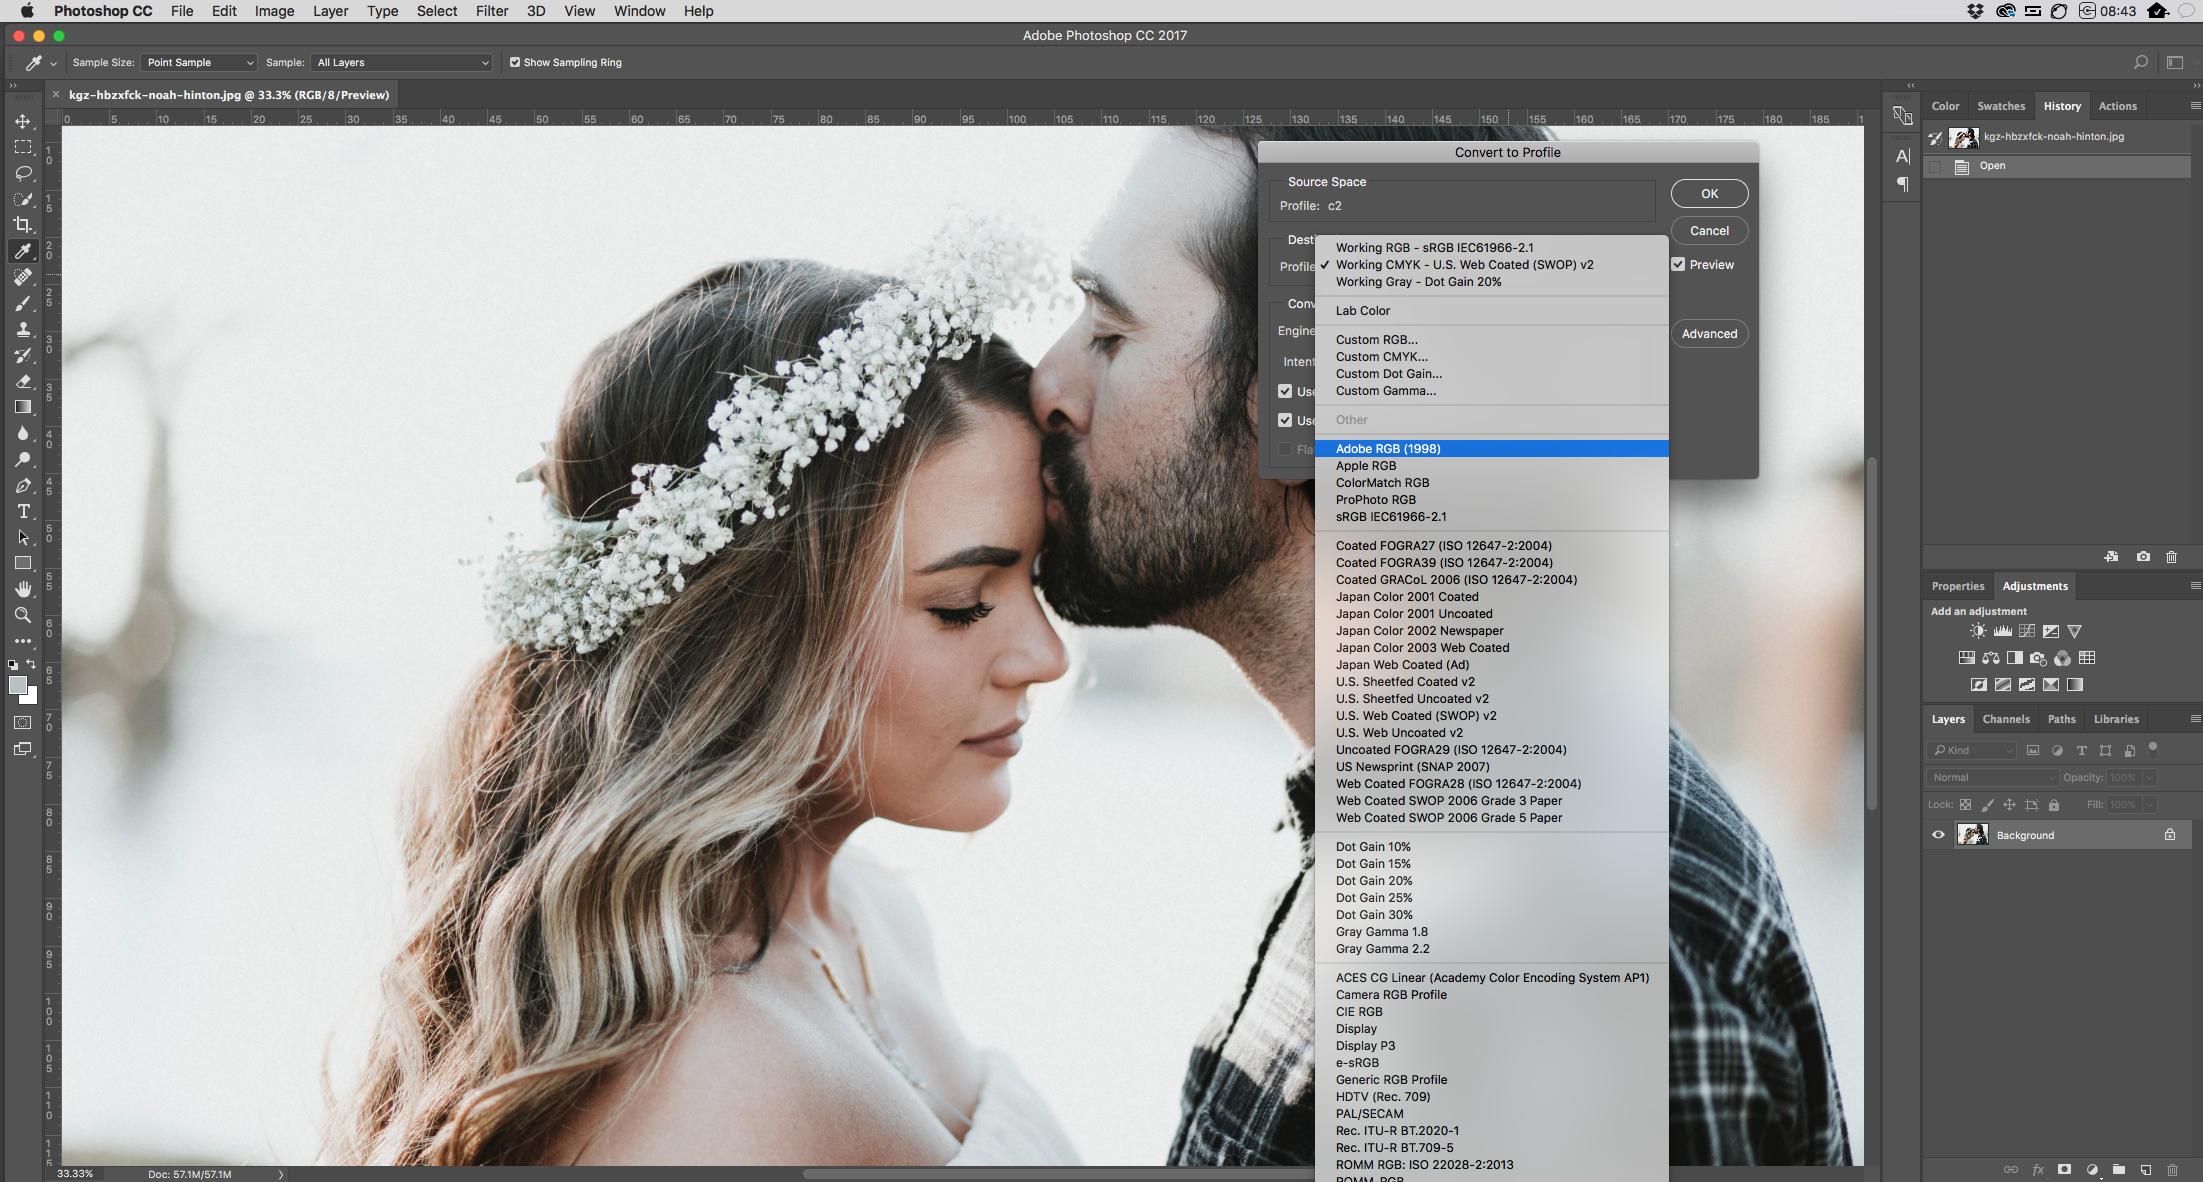 sRGB vs AdobeRGB vs ProPhoto RGB IN PHOTOSHOP